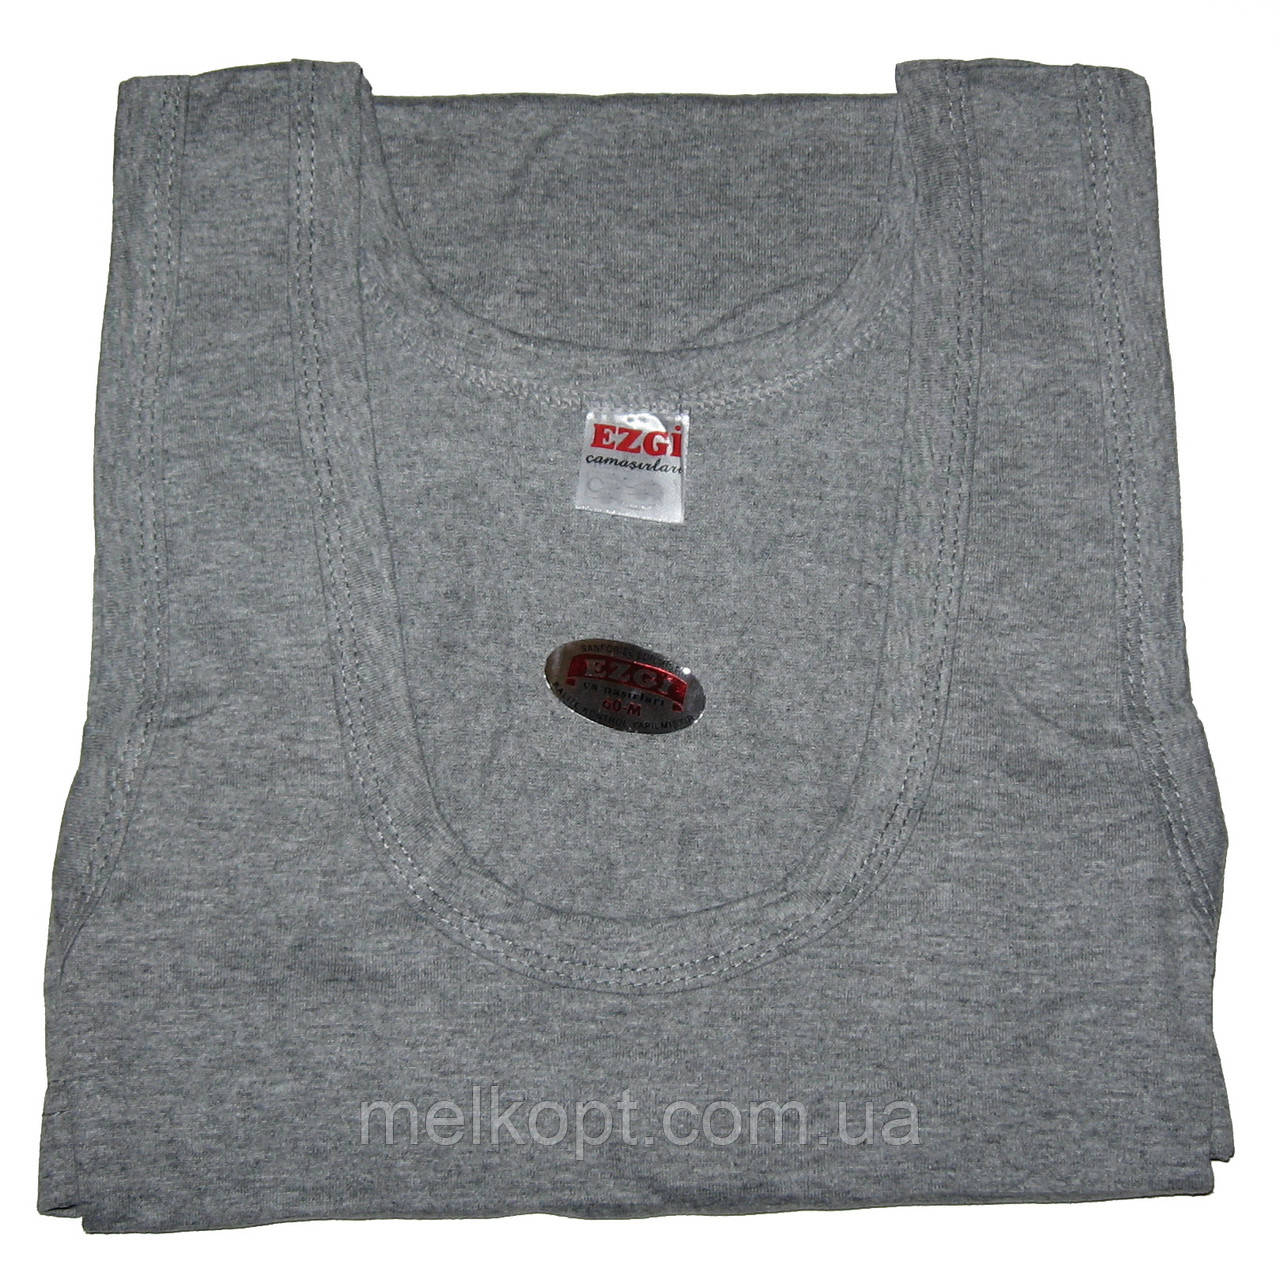 Мужские майки Ezgi - 37,00 грн./шт. (54-й размер, серые)